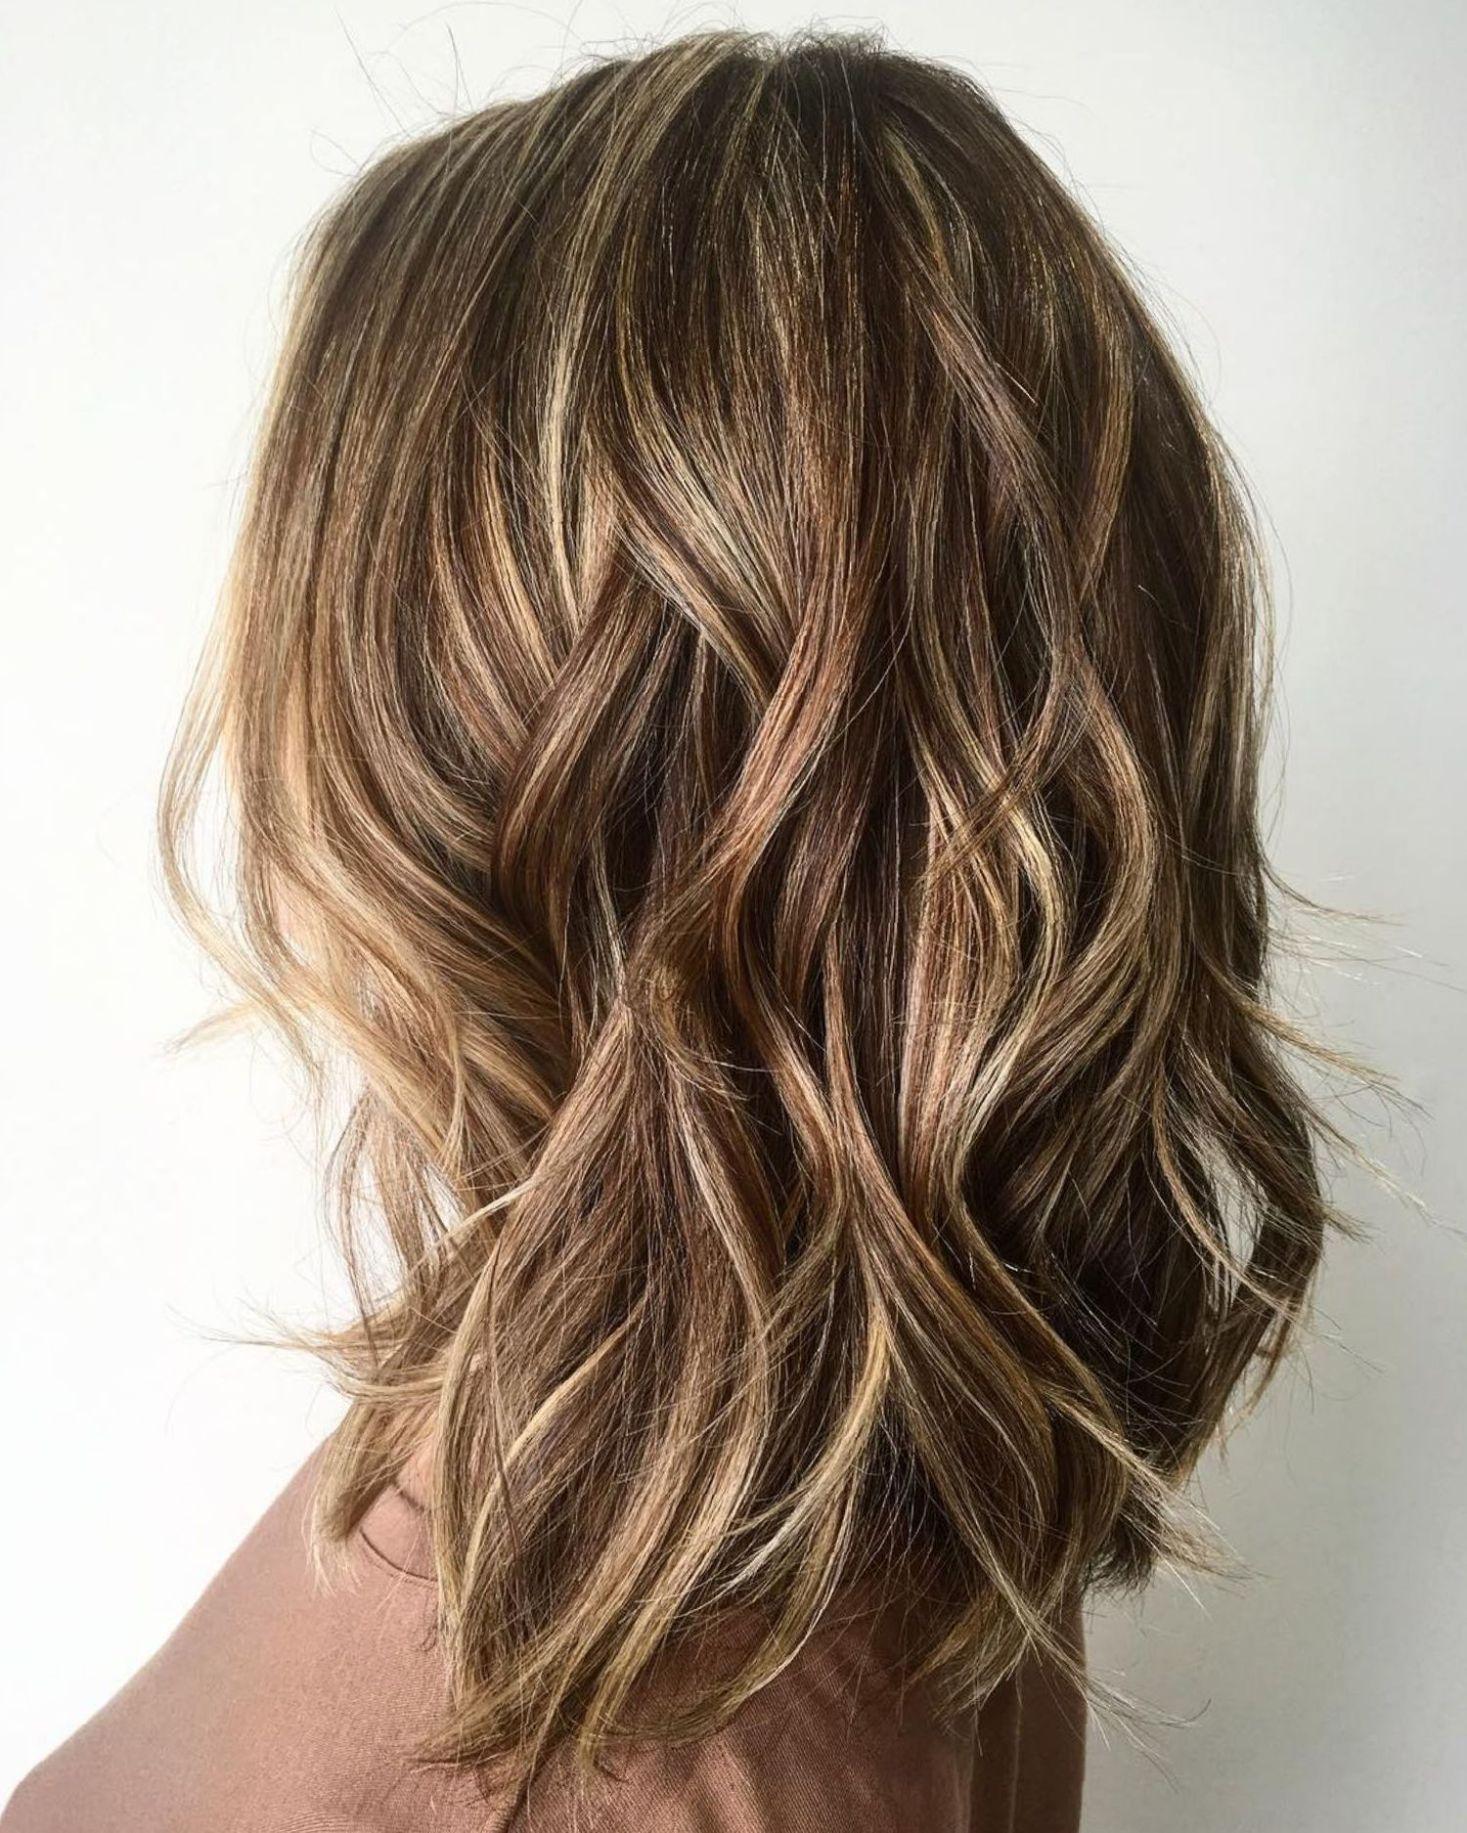 11 Fun and Flattering Medium Hairstyles for Women  Medium hair